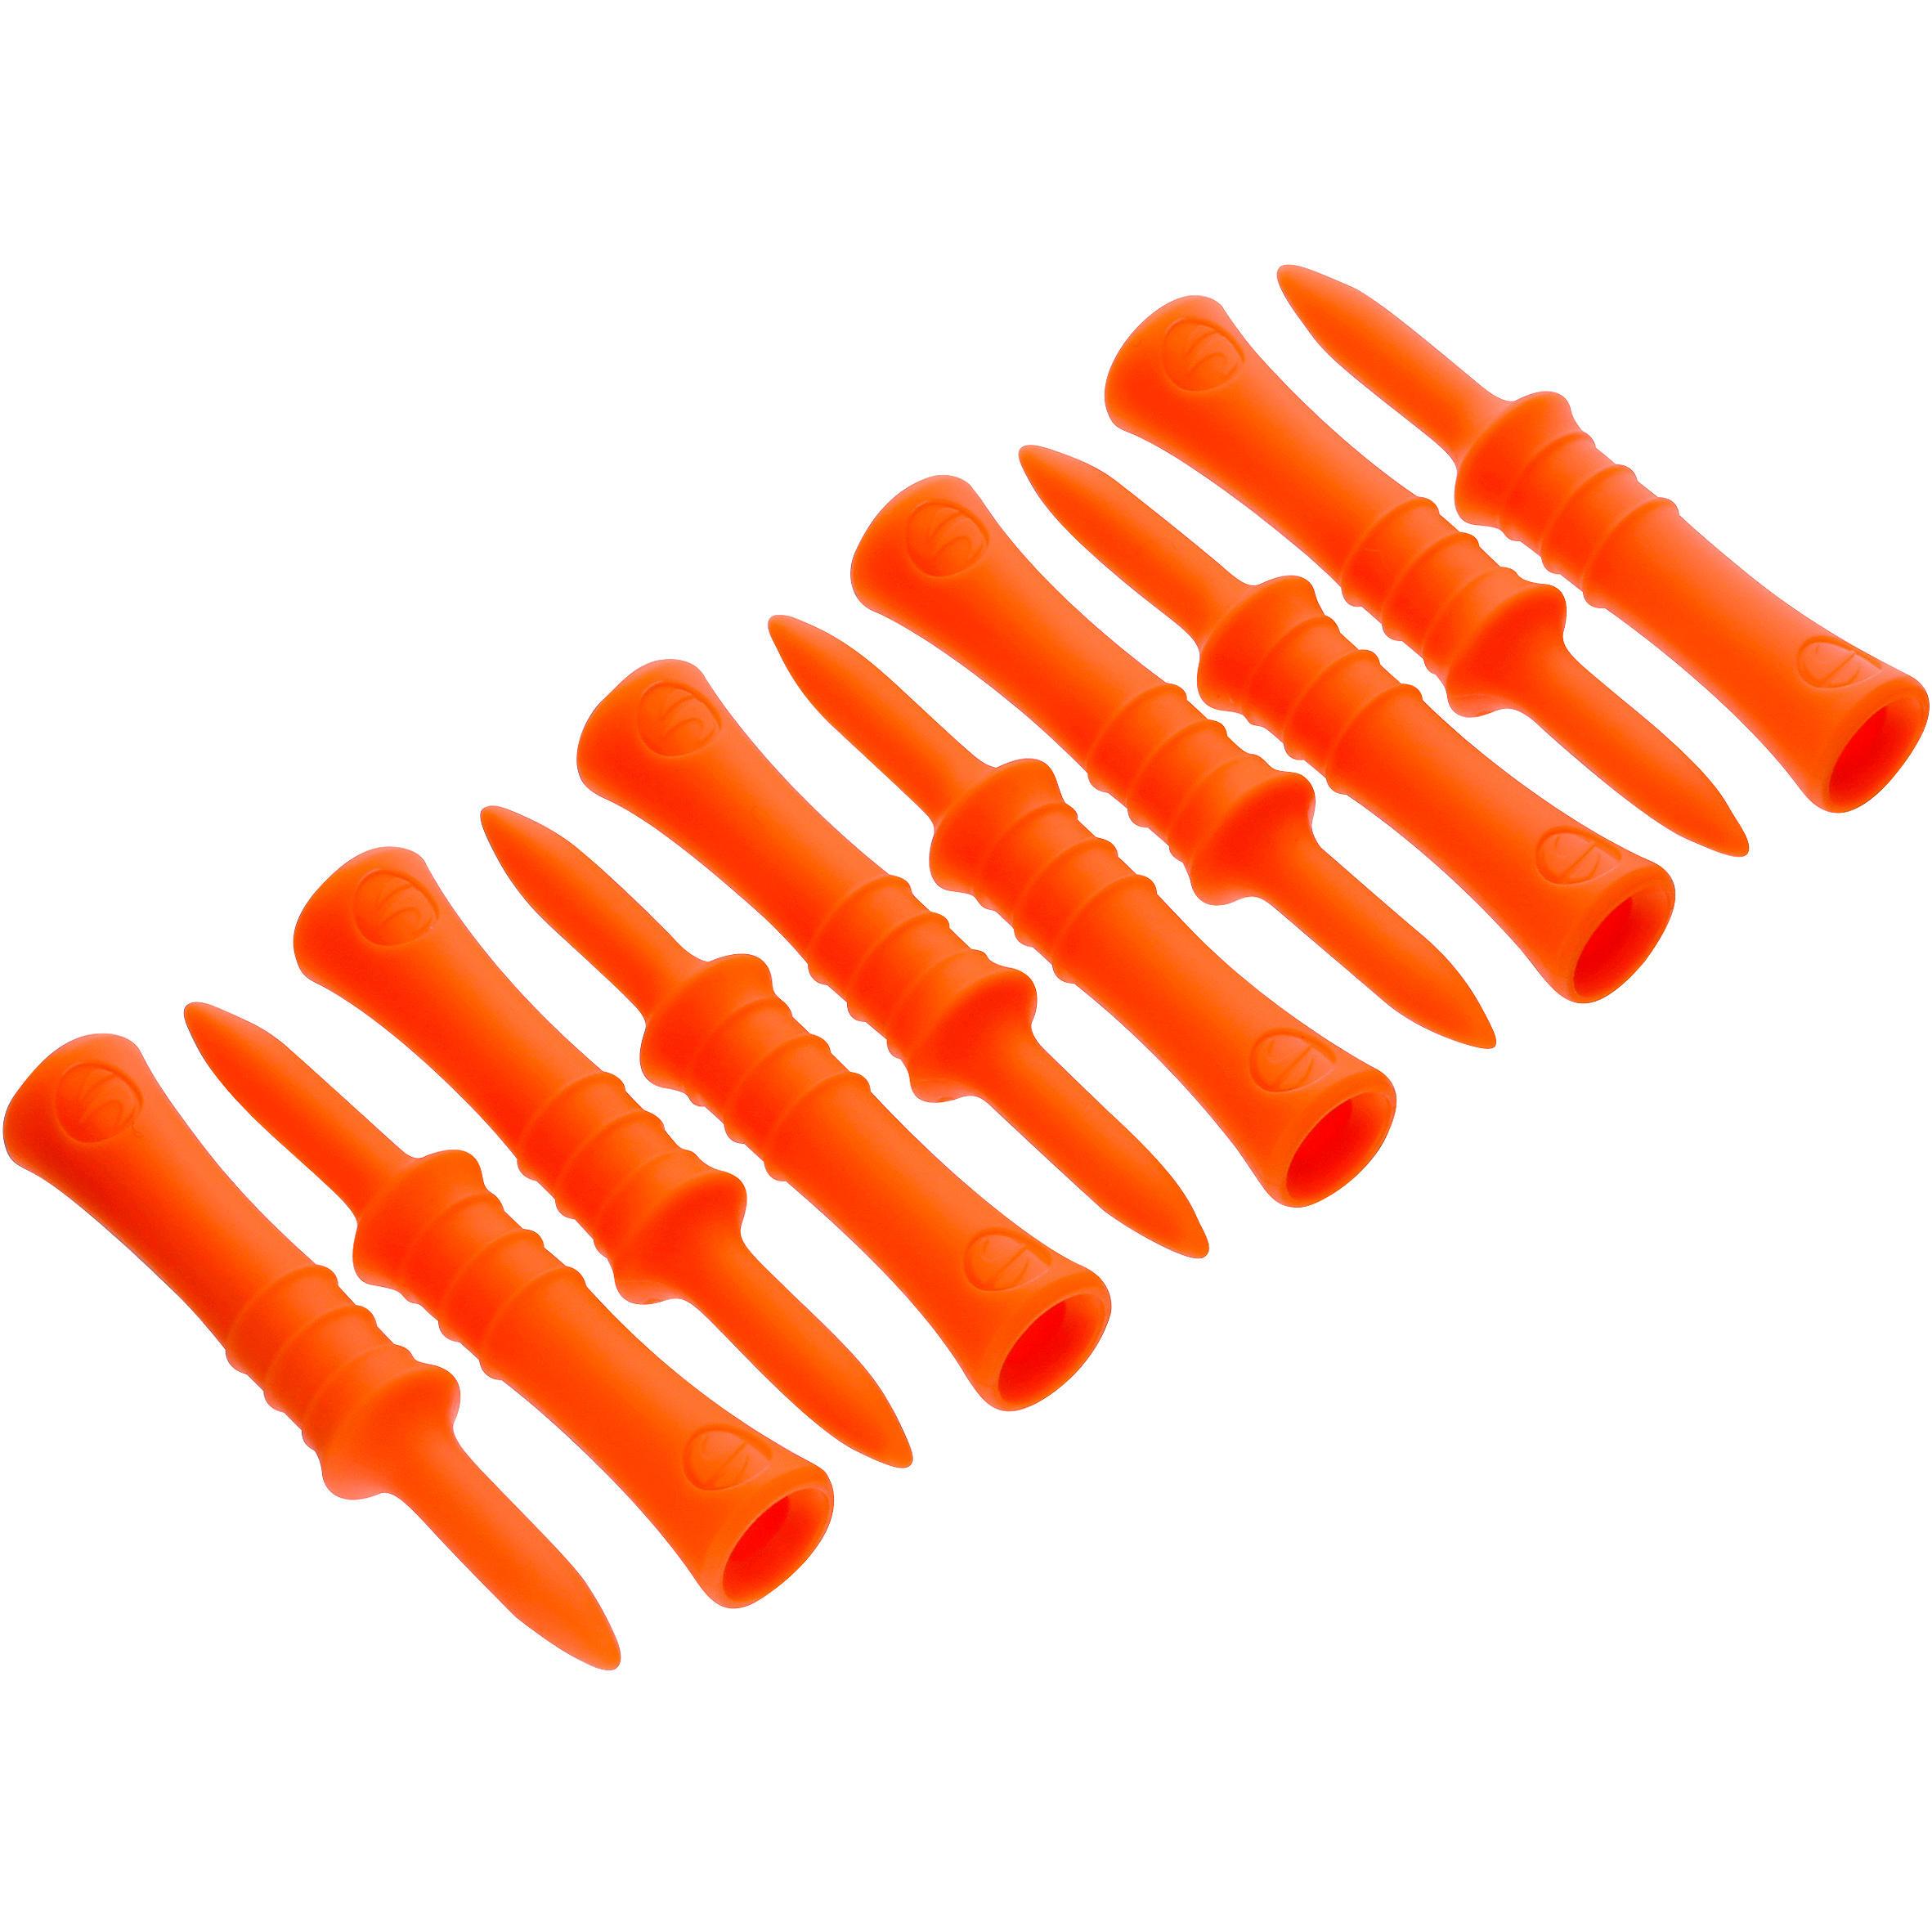 x10 37 mm Step Tee - Orange